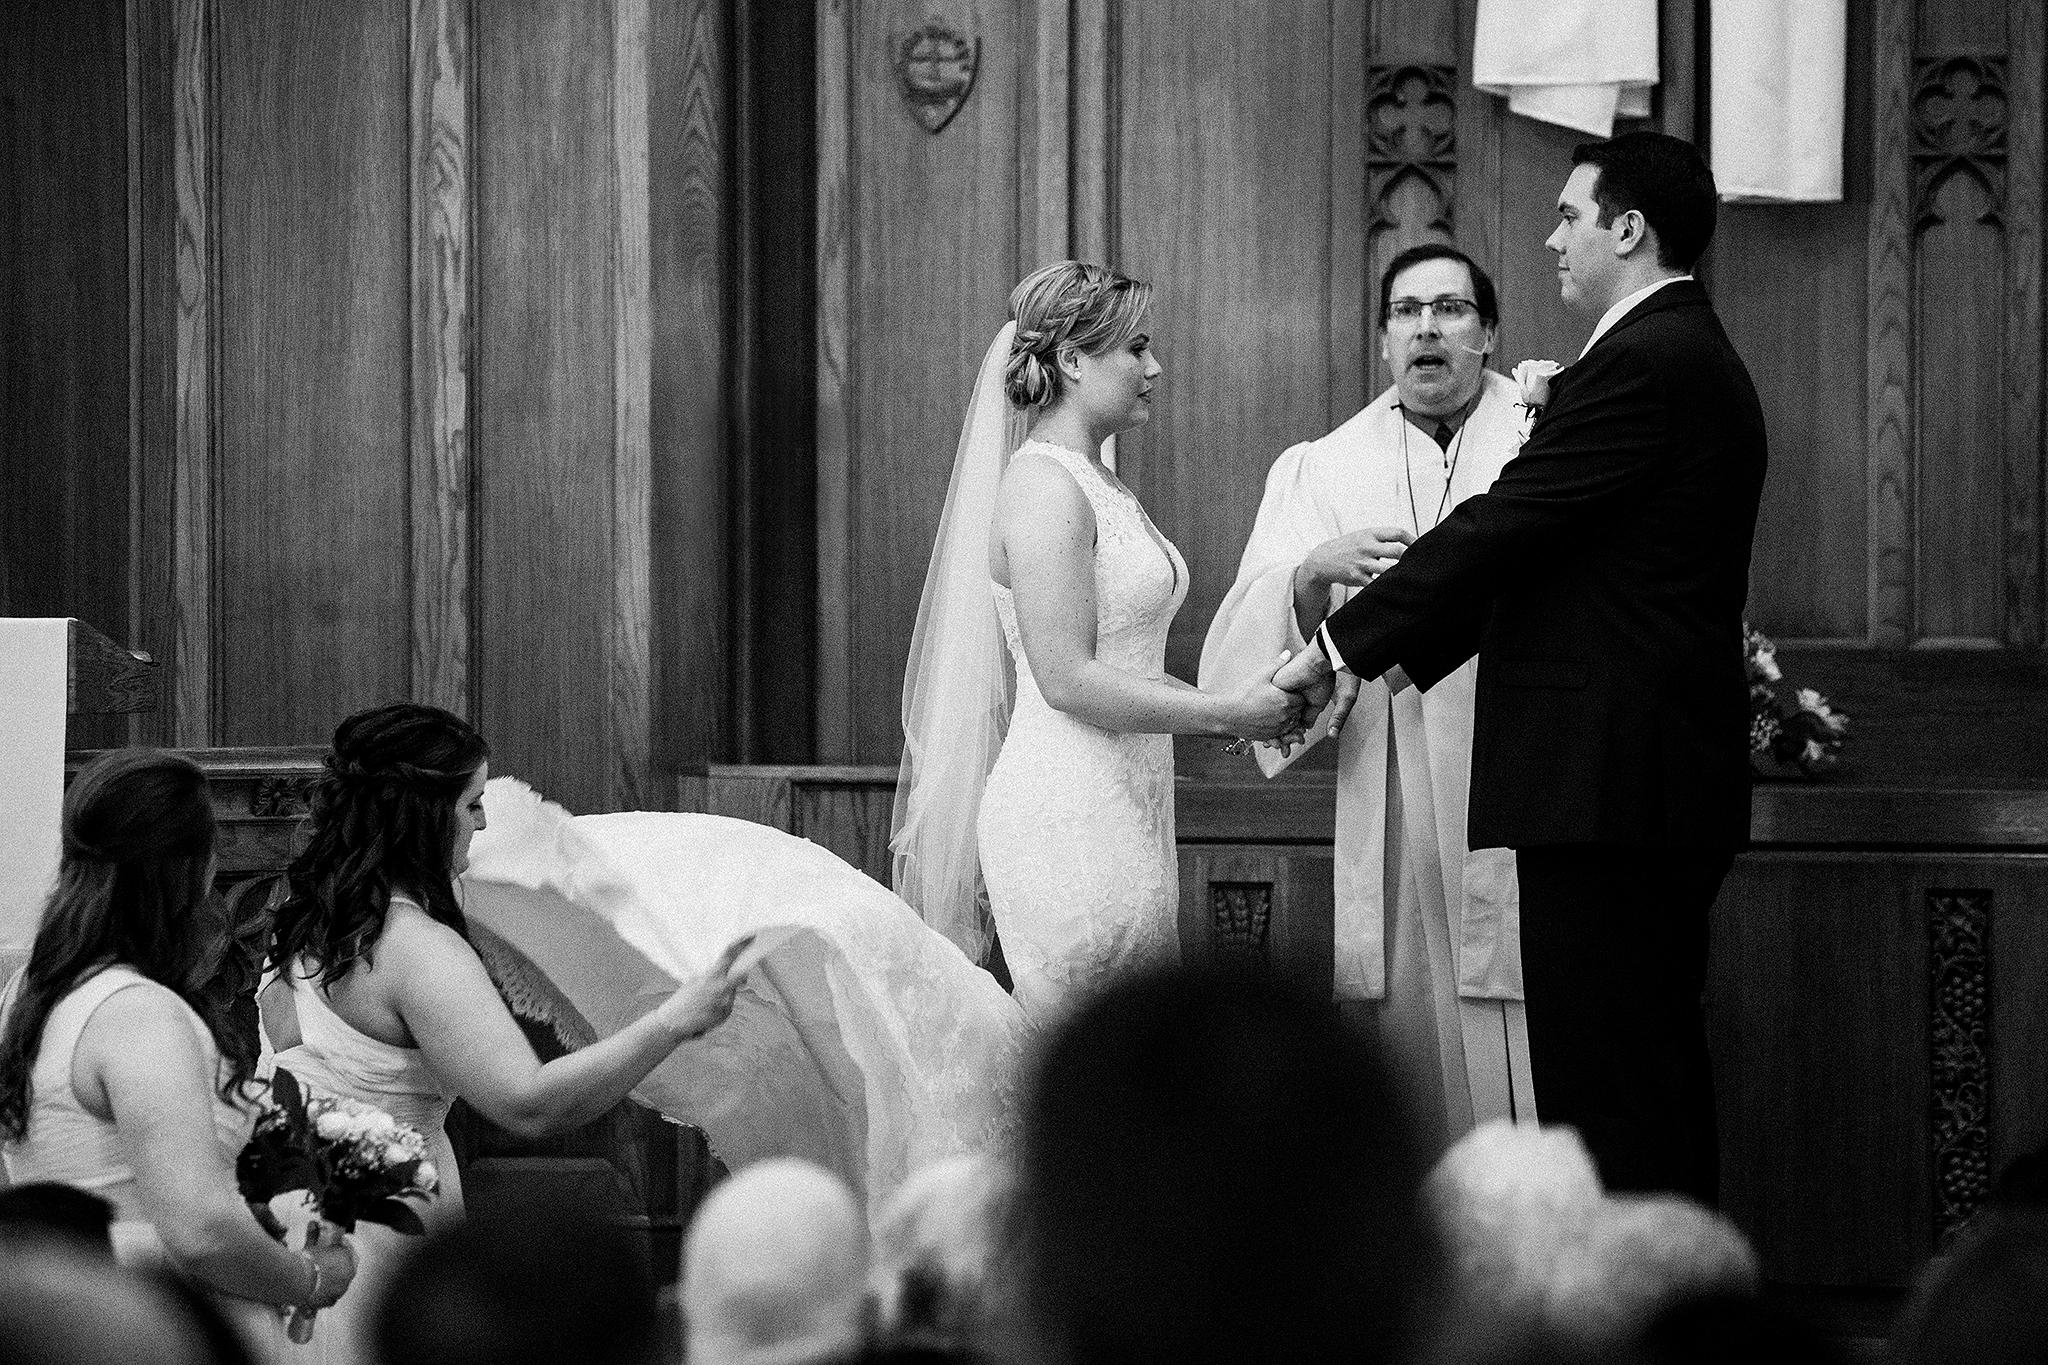 first-united-methodist-church-dekalb-il-wedding-photographer